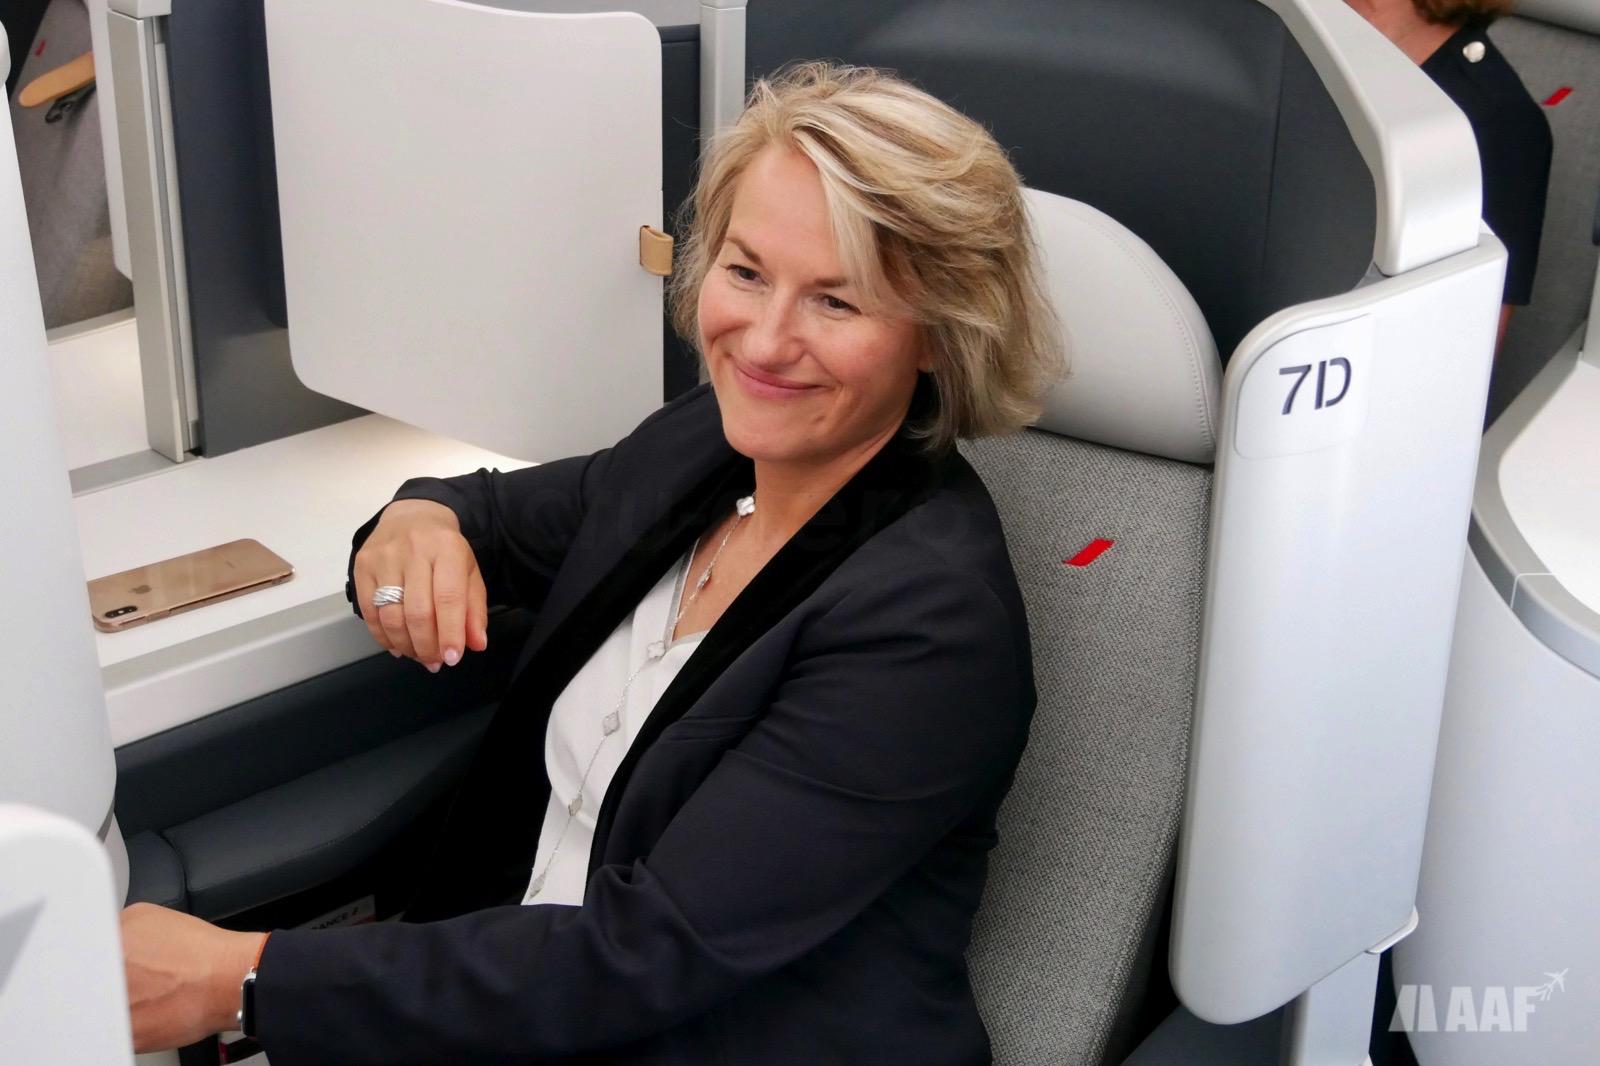 Anne Rigail [DG d'Air France] dans le nouveau siège Business A350 Air France [F-HTYA / MSN331 / F-WZFN] © AAF - reproduction interdite